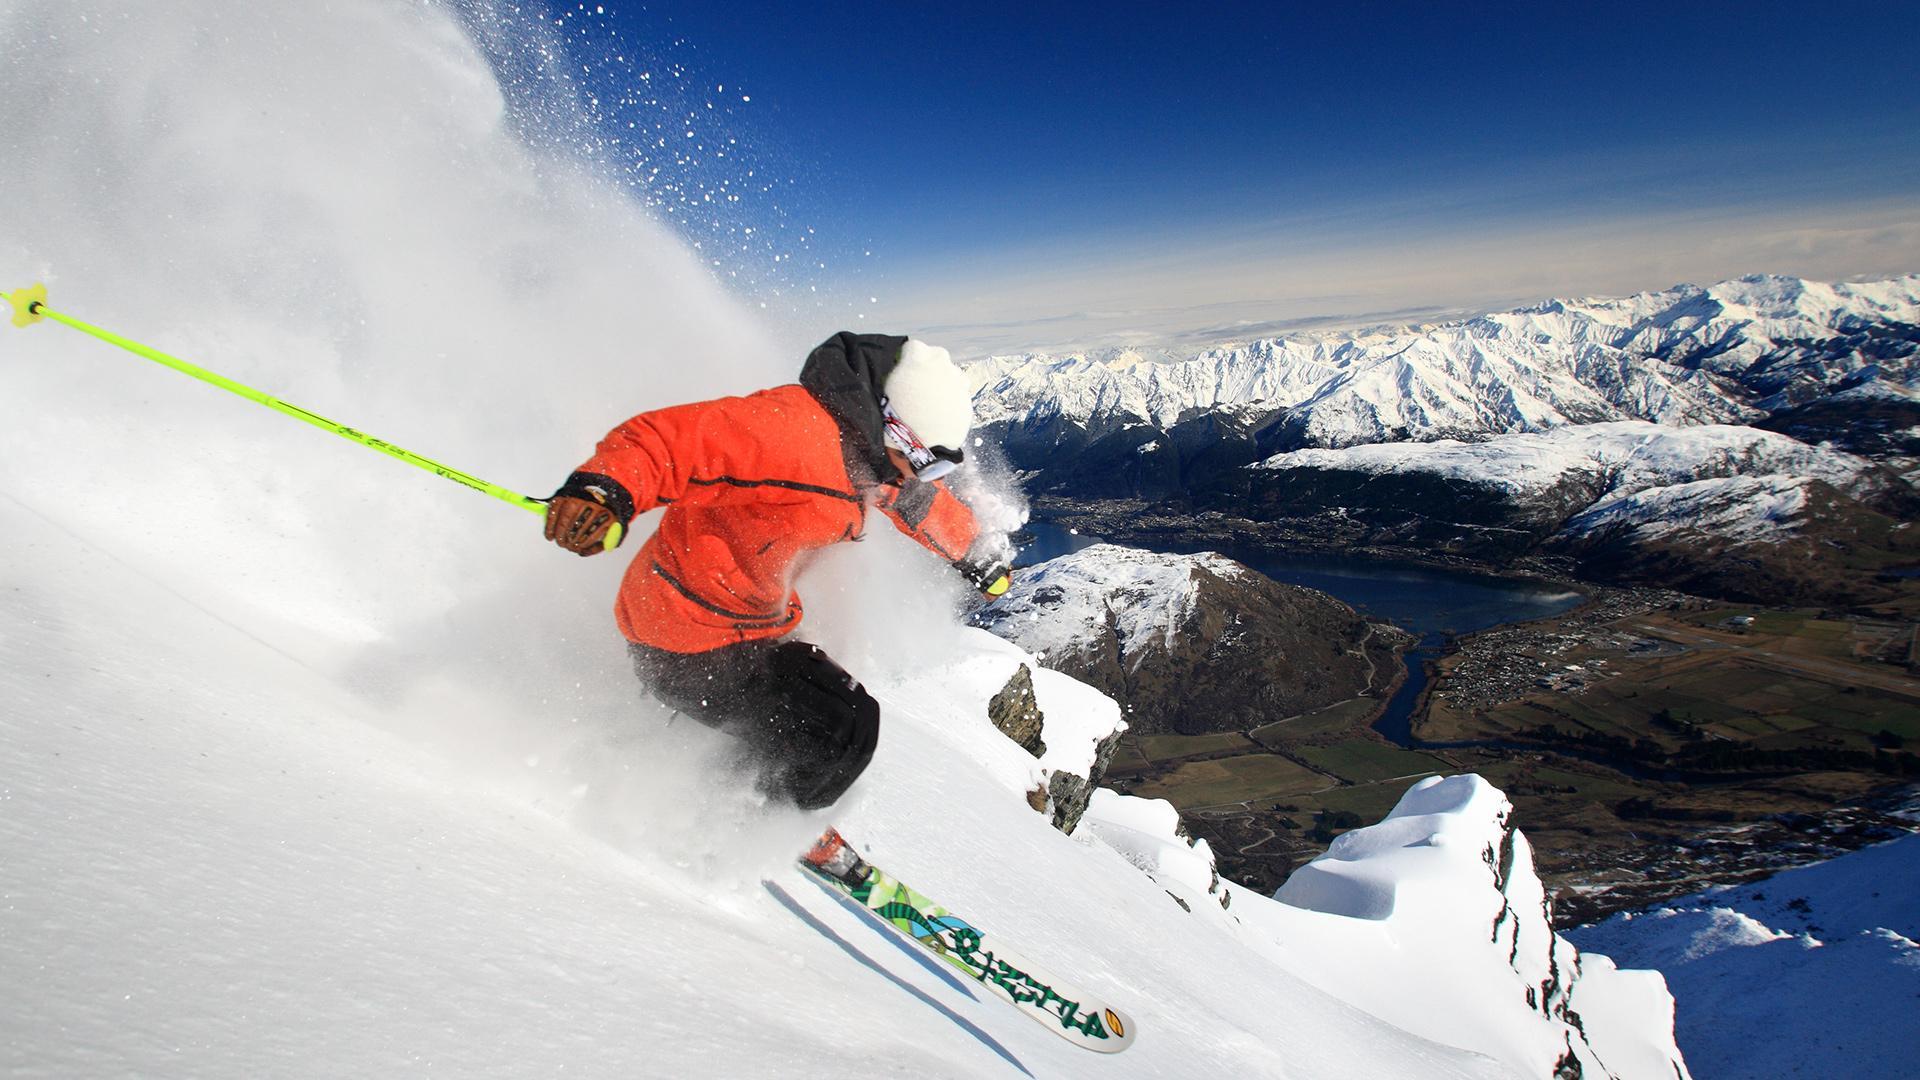 Lake View Hotel Room Ski Season - Aug 20 image 1 at Edgewater Lake Wanaka by null, Otago, New Zealand